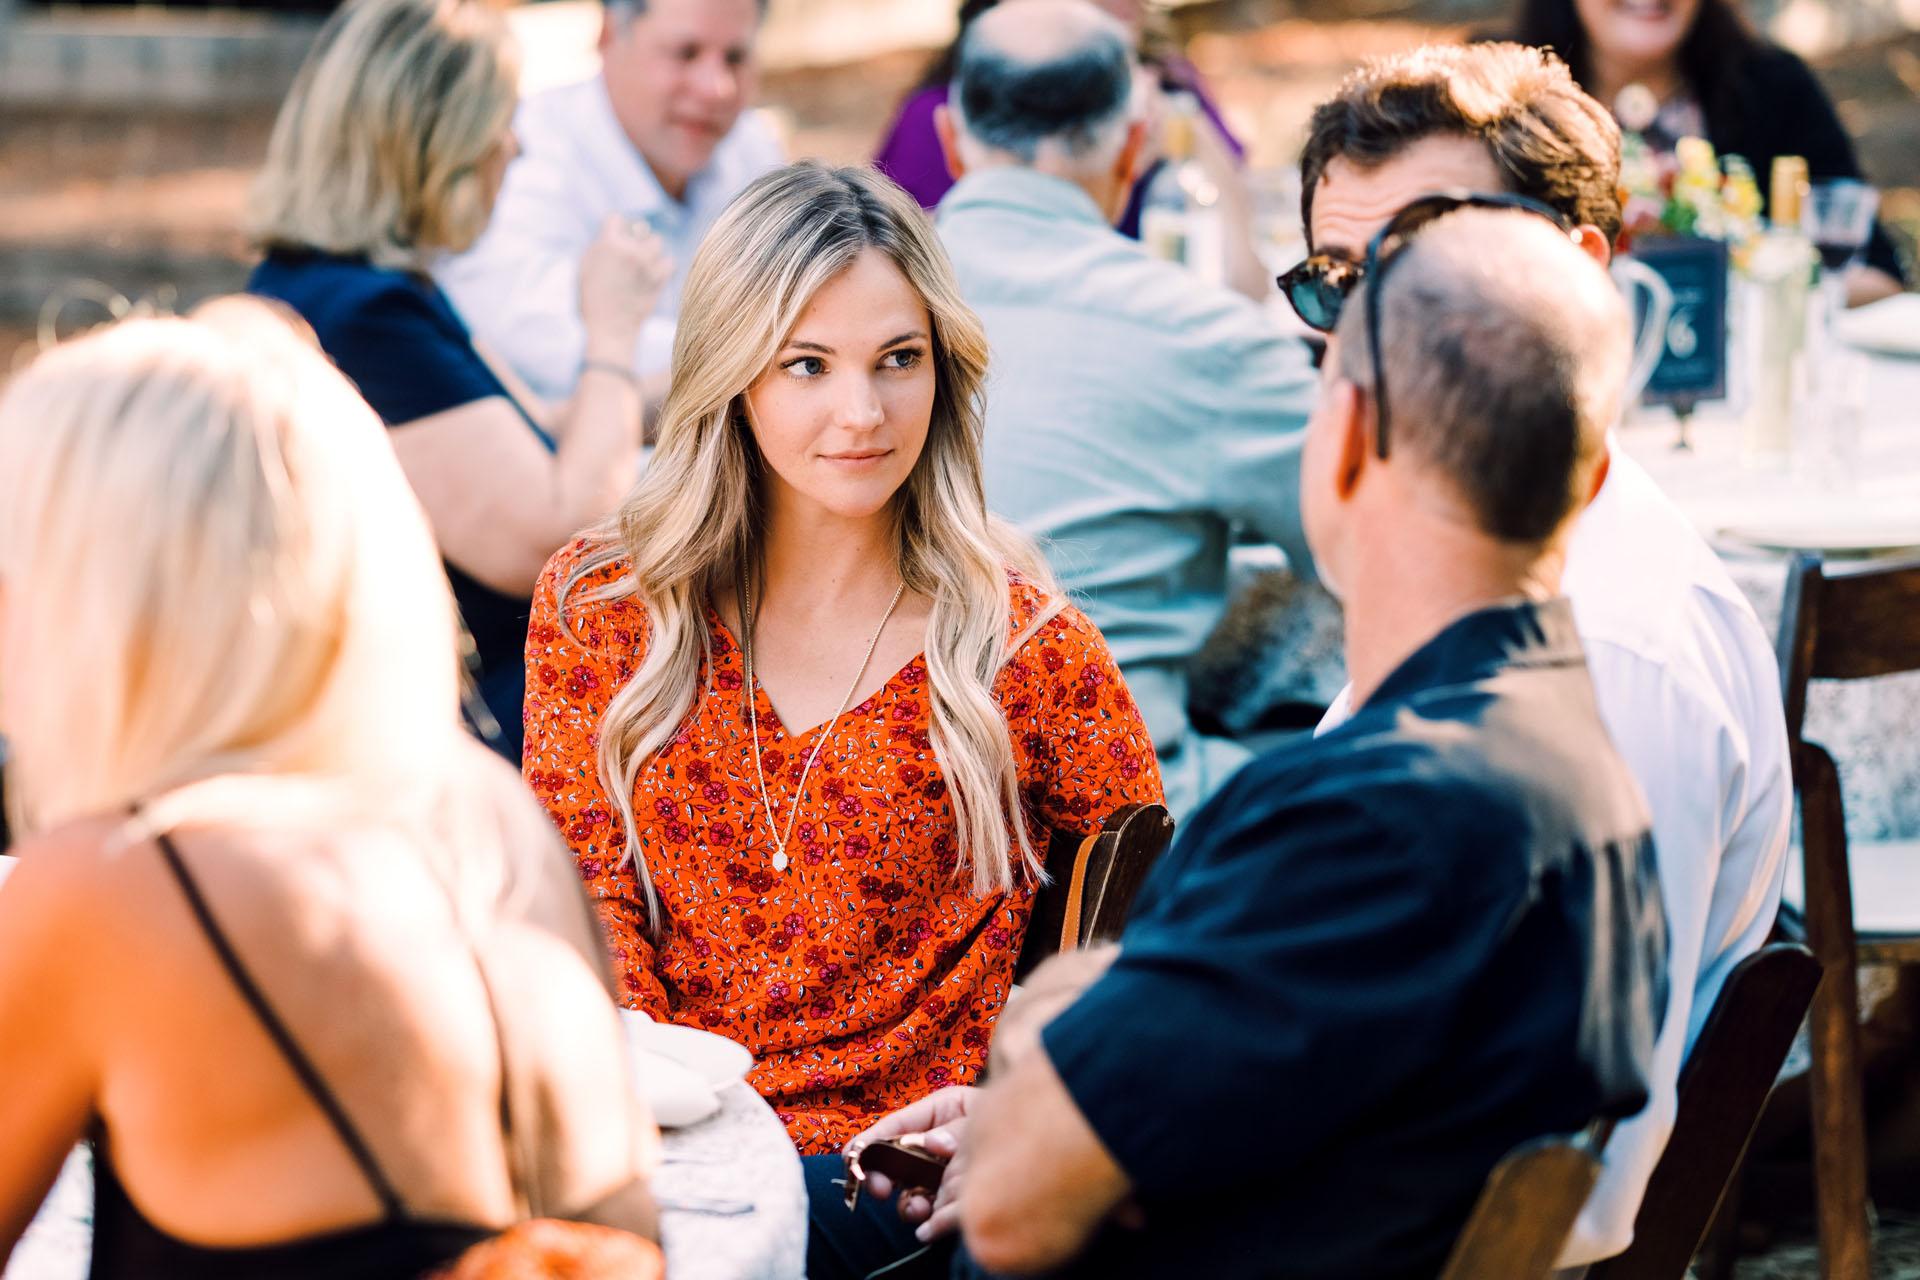 10-7-17 Devon and Jordan's Wedding-140.jpg